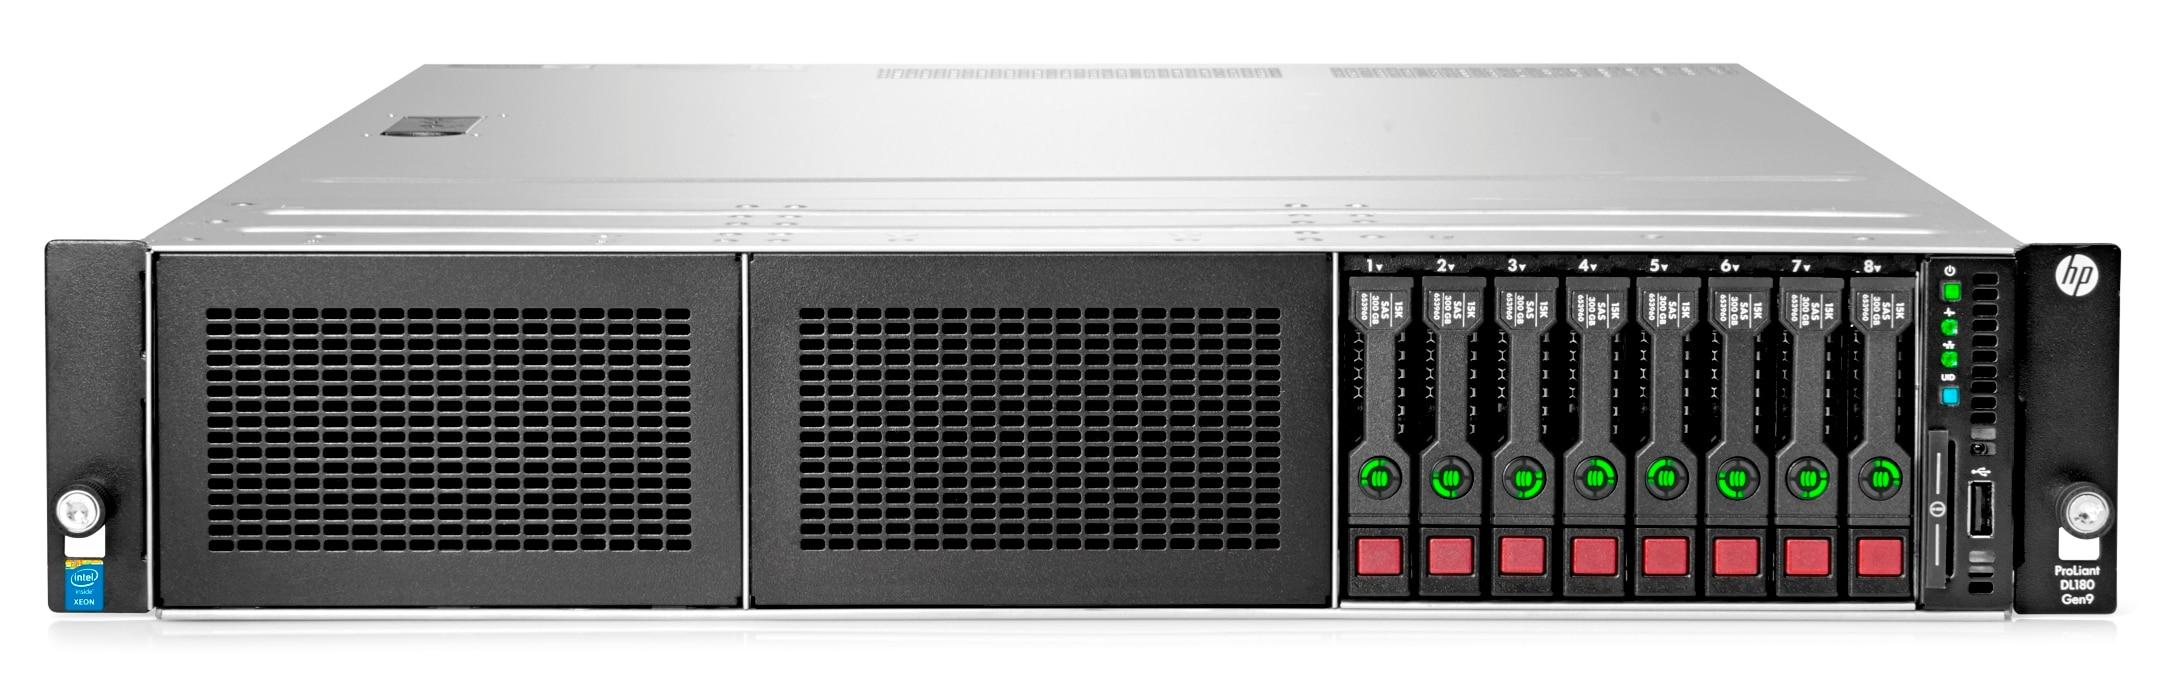 HP Press Kit: Reimagine the server. Think compute.